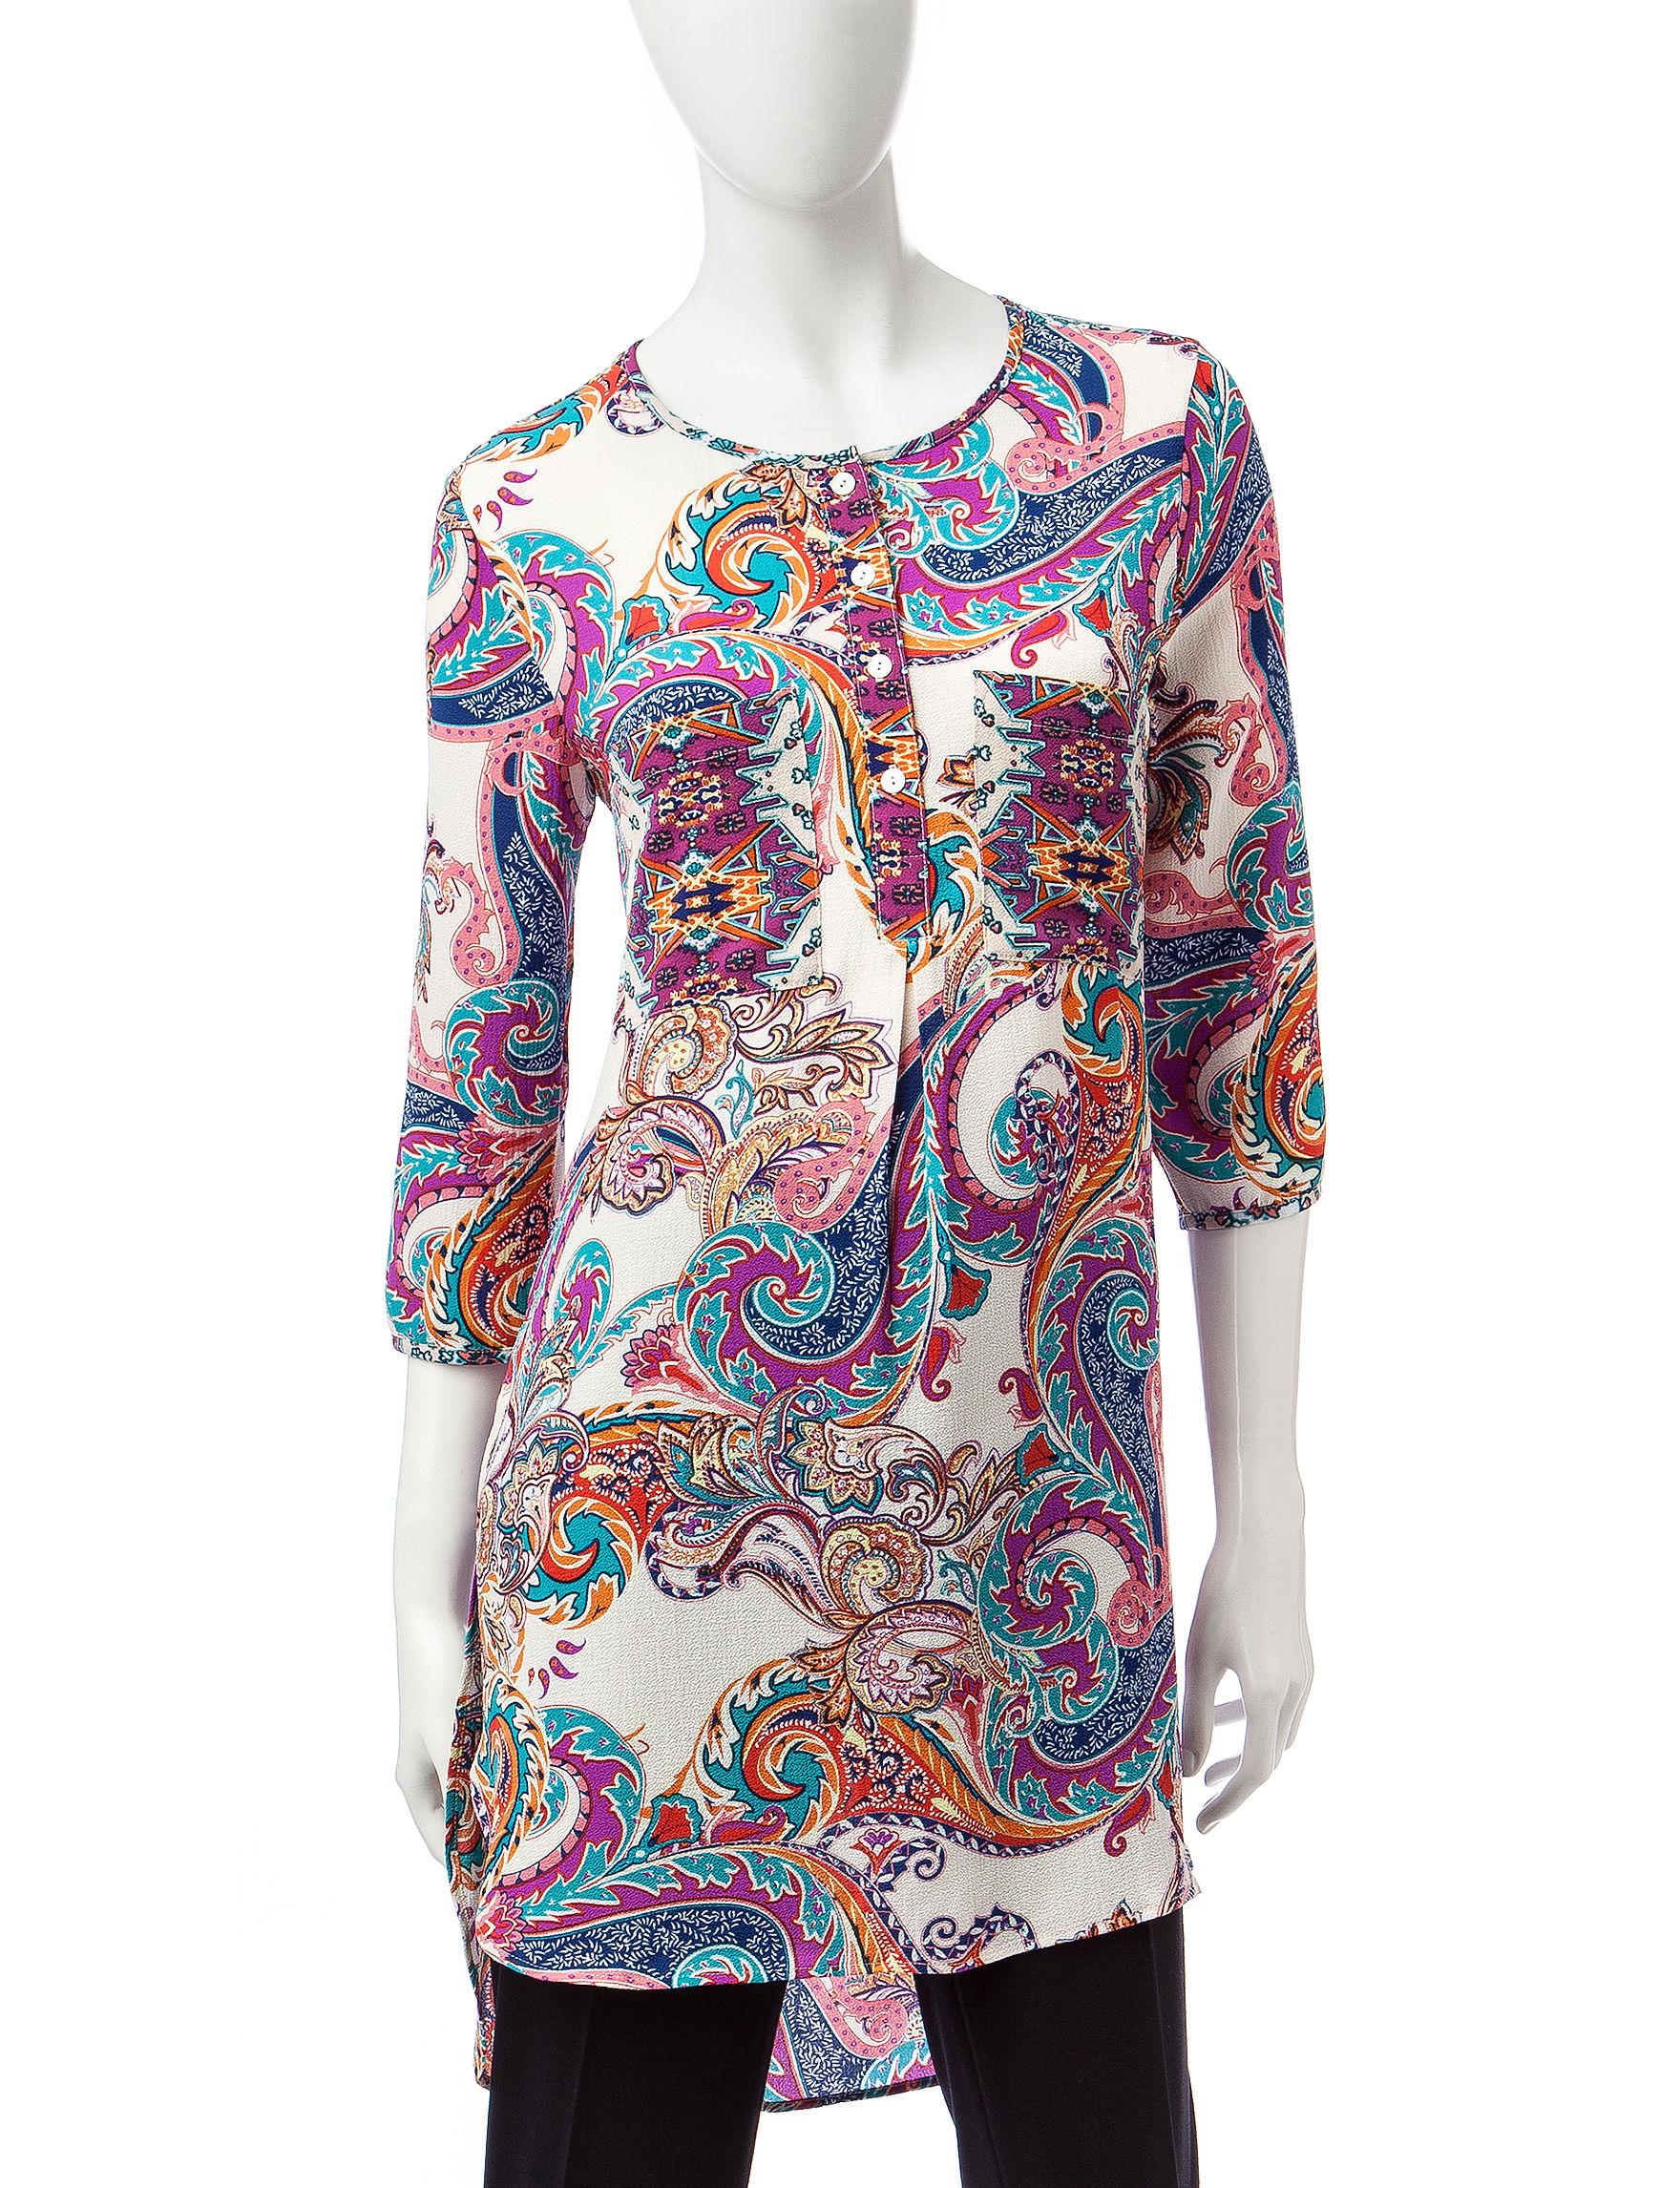 Valerie Stevens Peach Shirts & Blouses